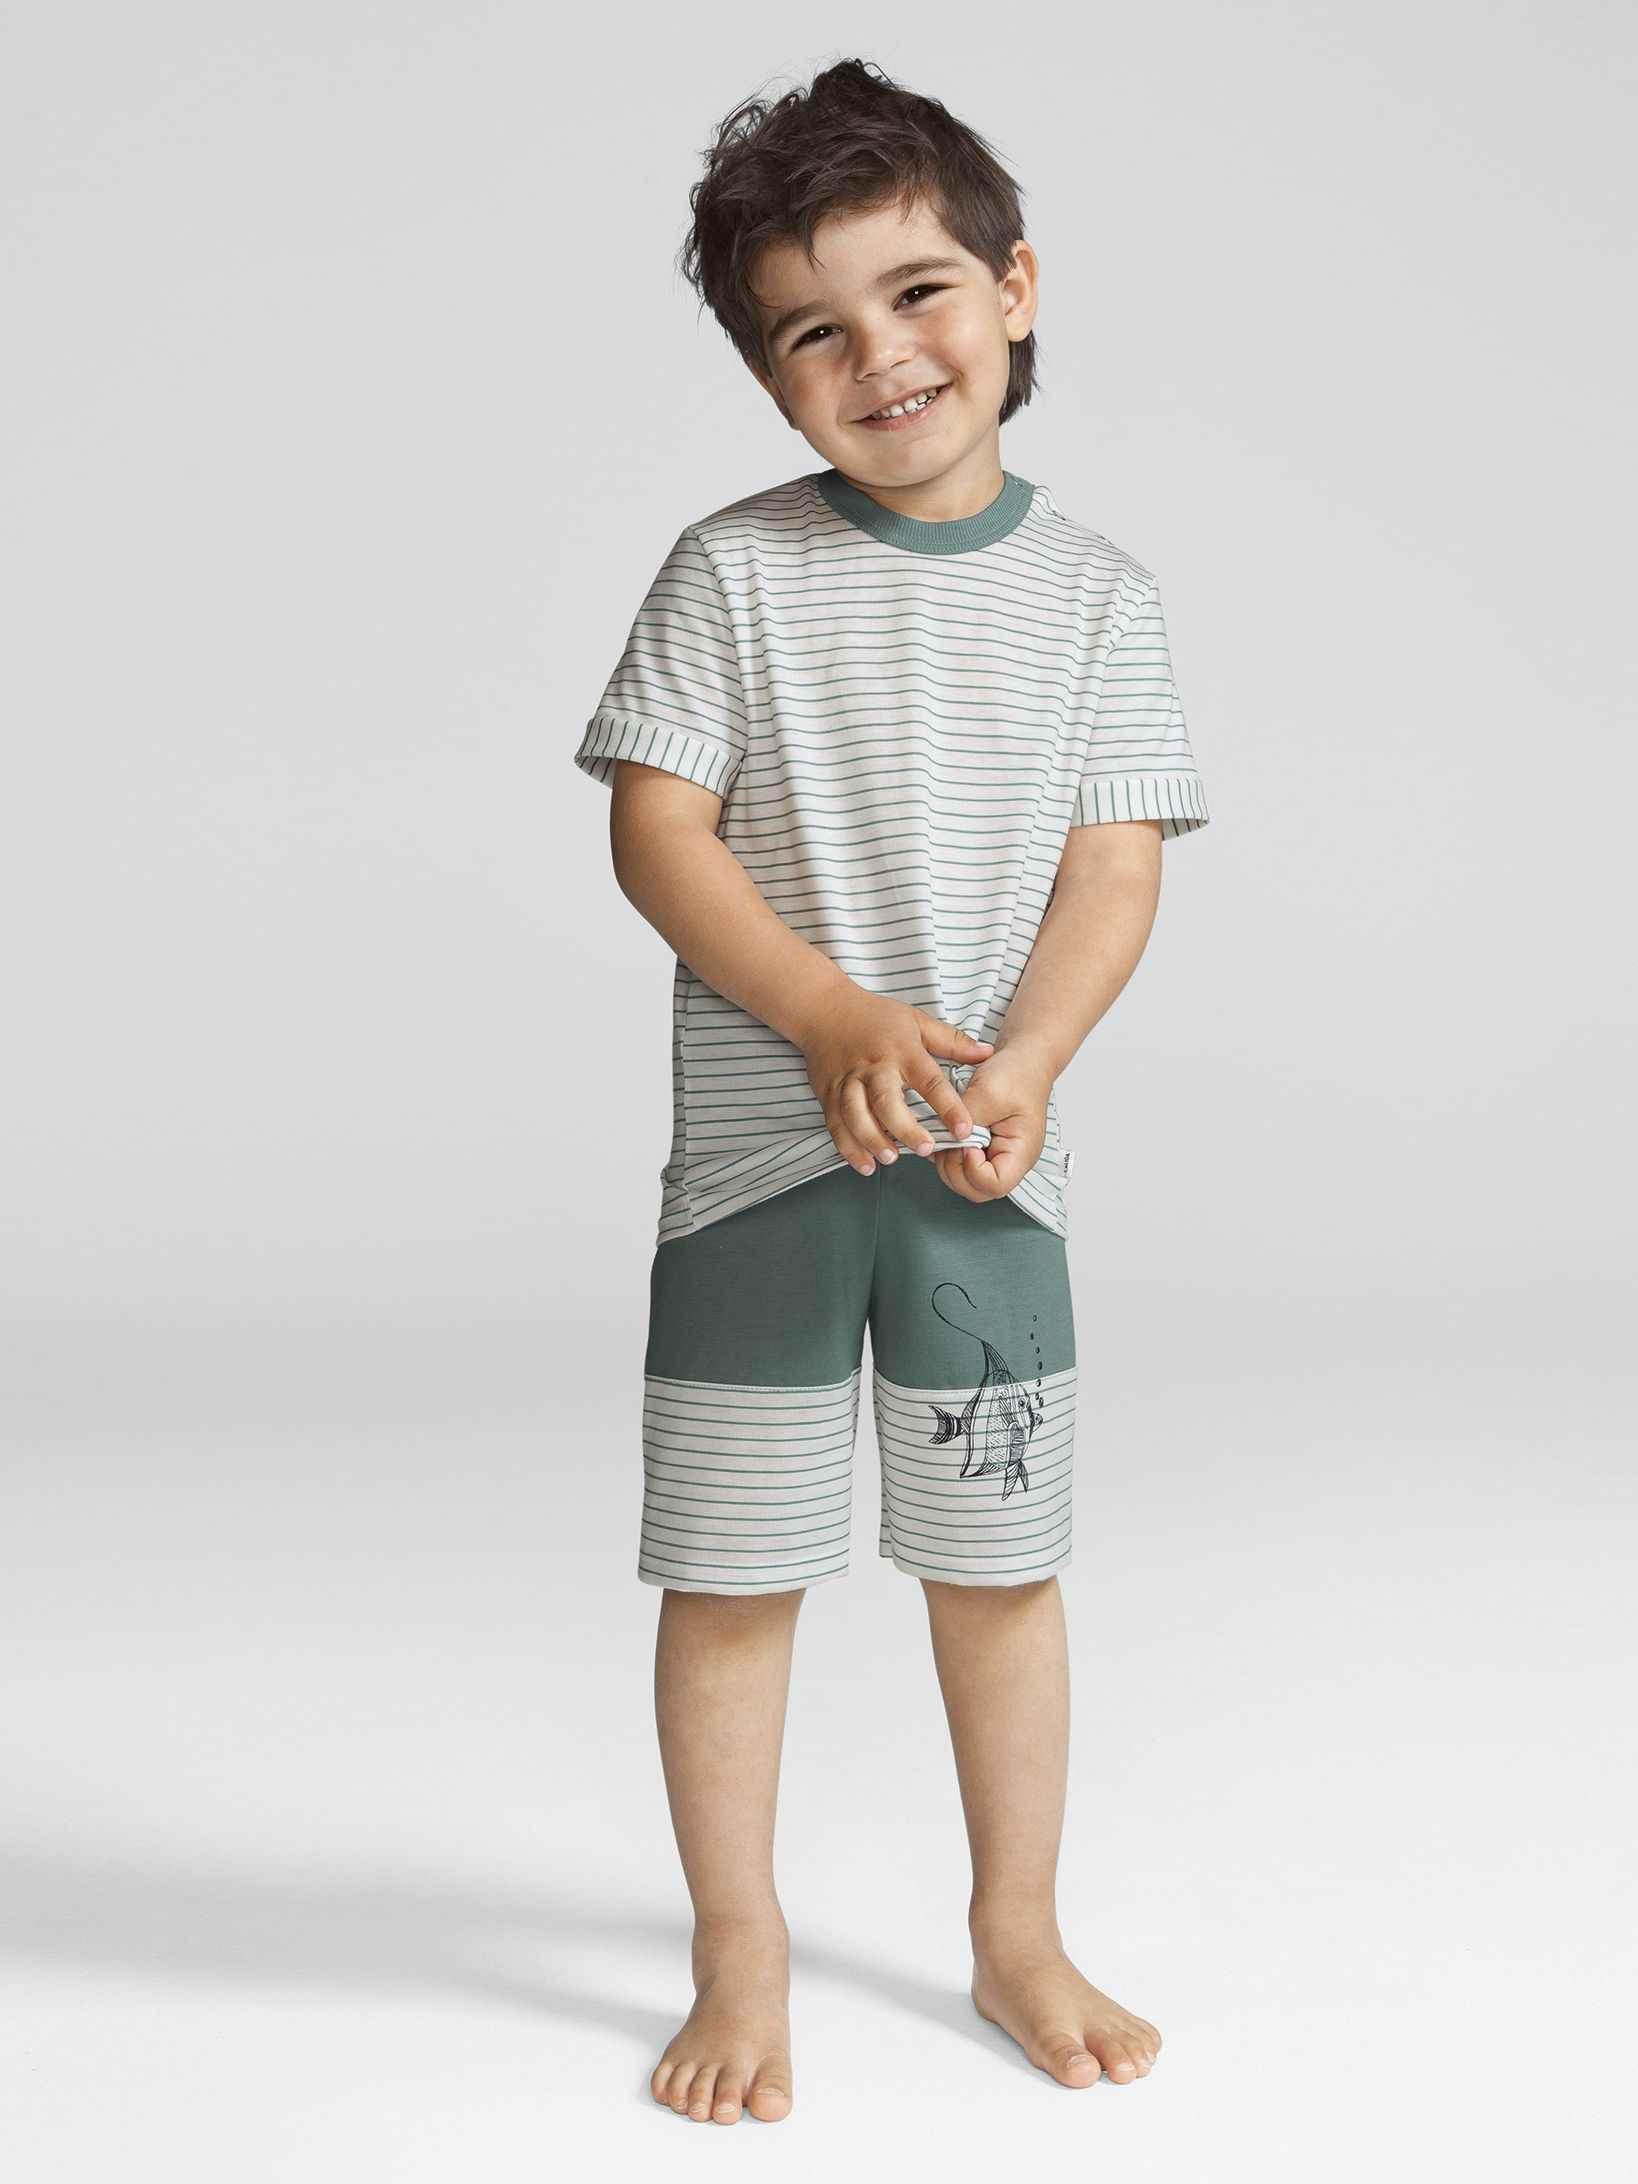 Kinder CALIDA Under The Sea Kinder-Kurz-Pyjama grün   07613381022504